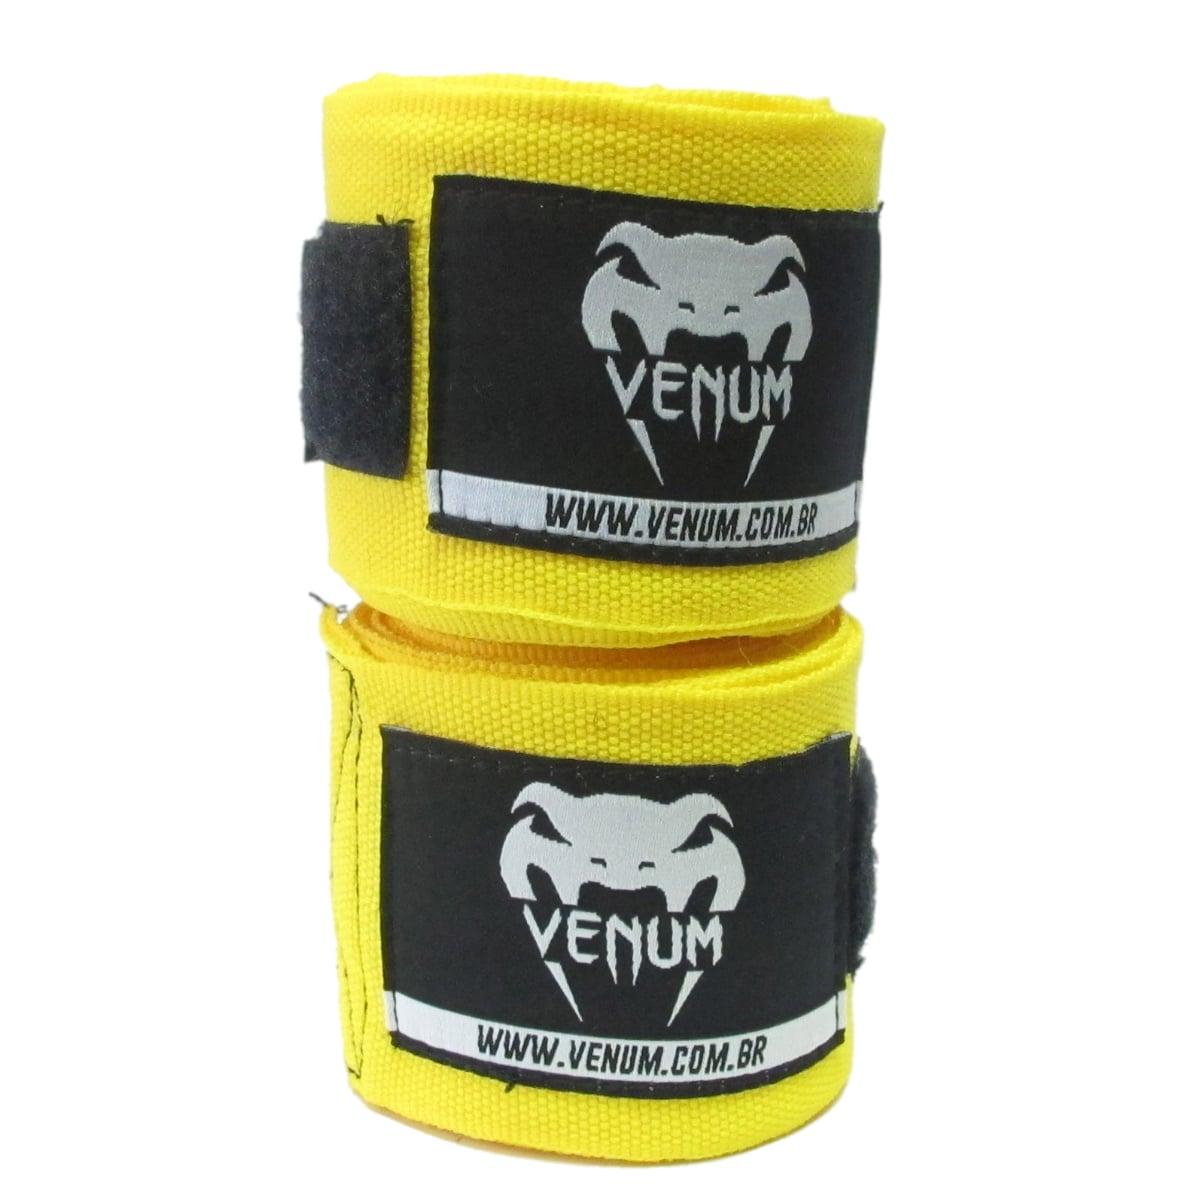 Bandagem Elástica Venum 4 Metros - Amarela